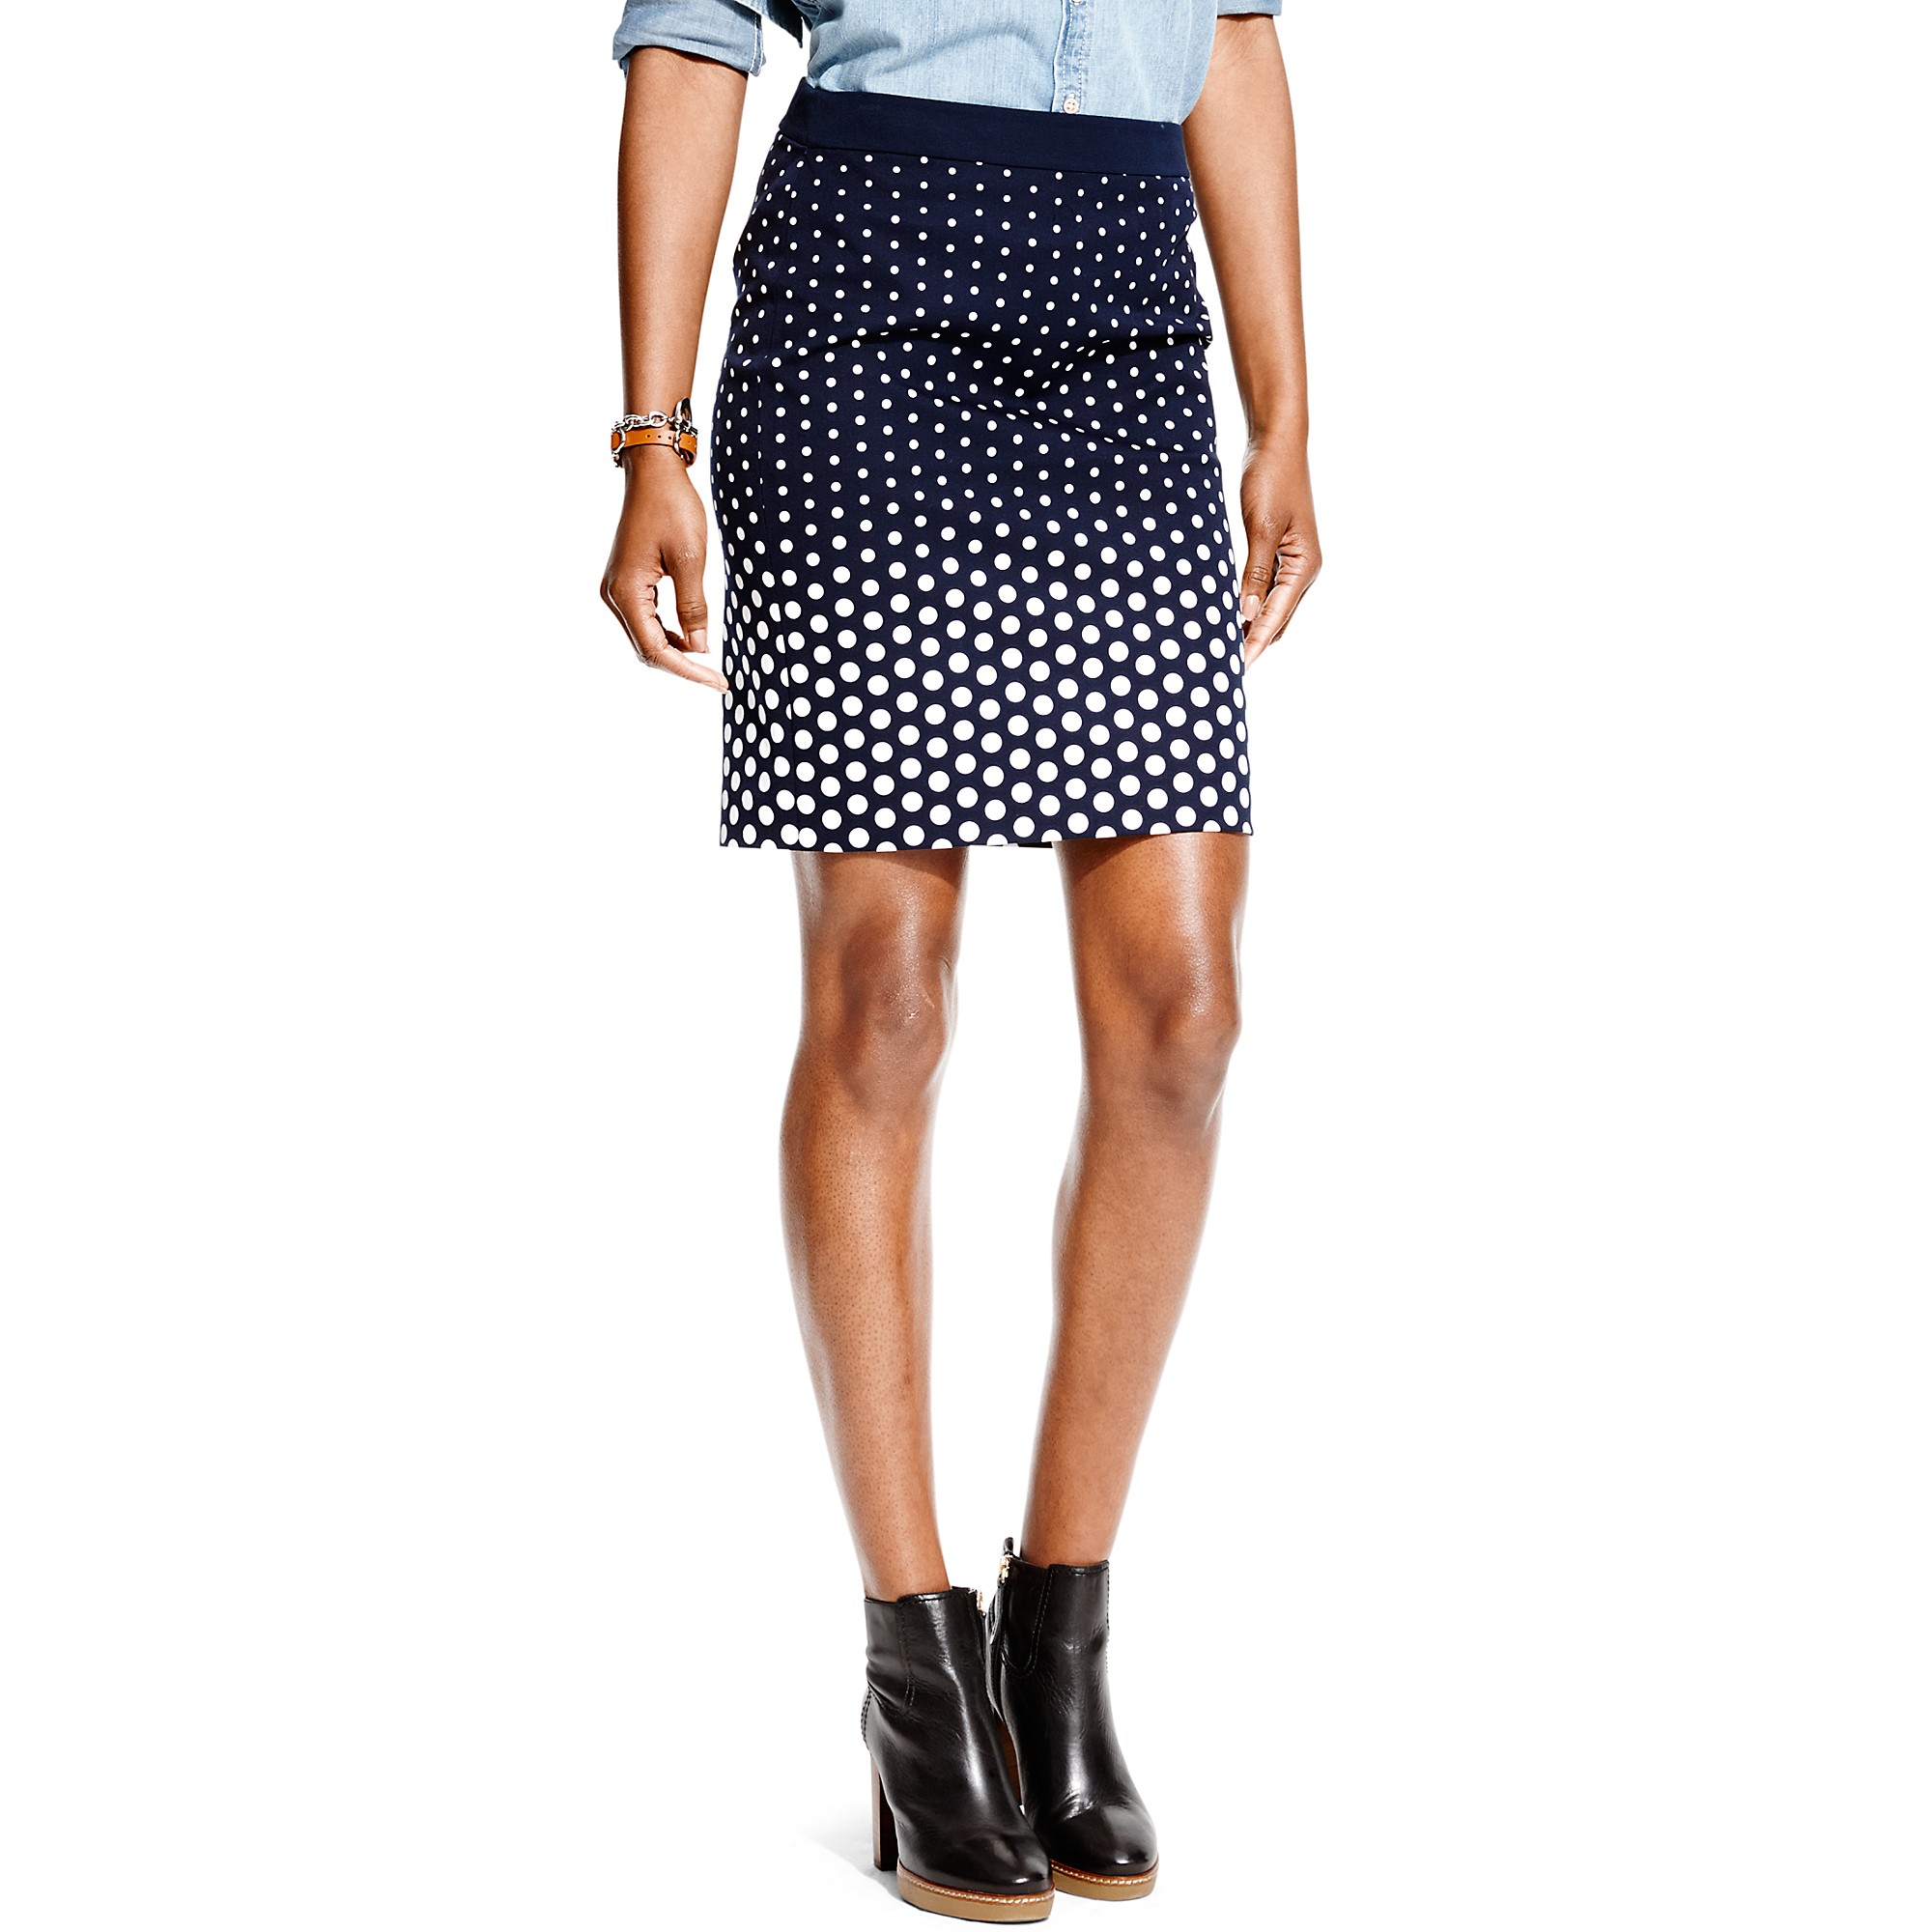 hilfiger ombre dot pencil skirt in blue navy